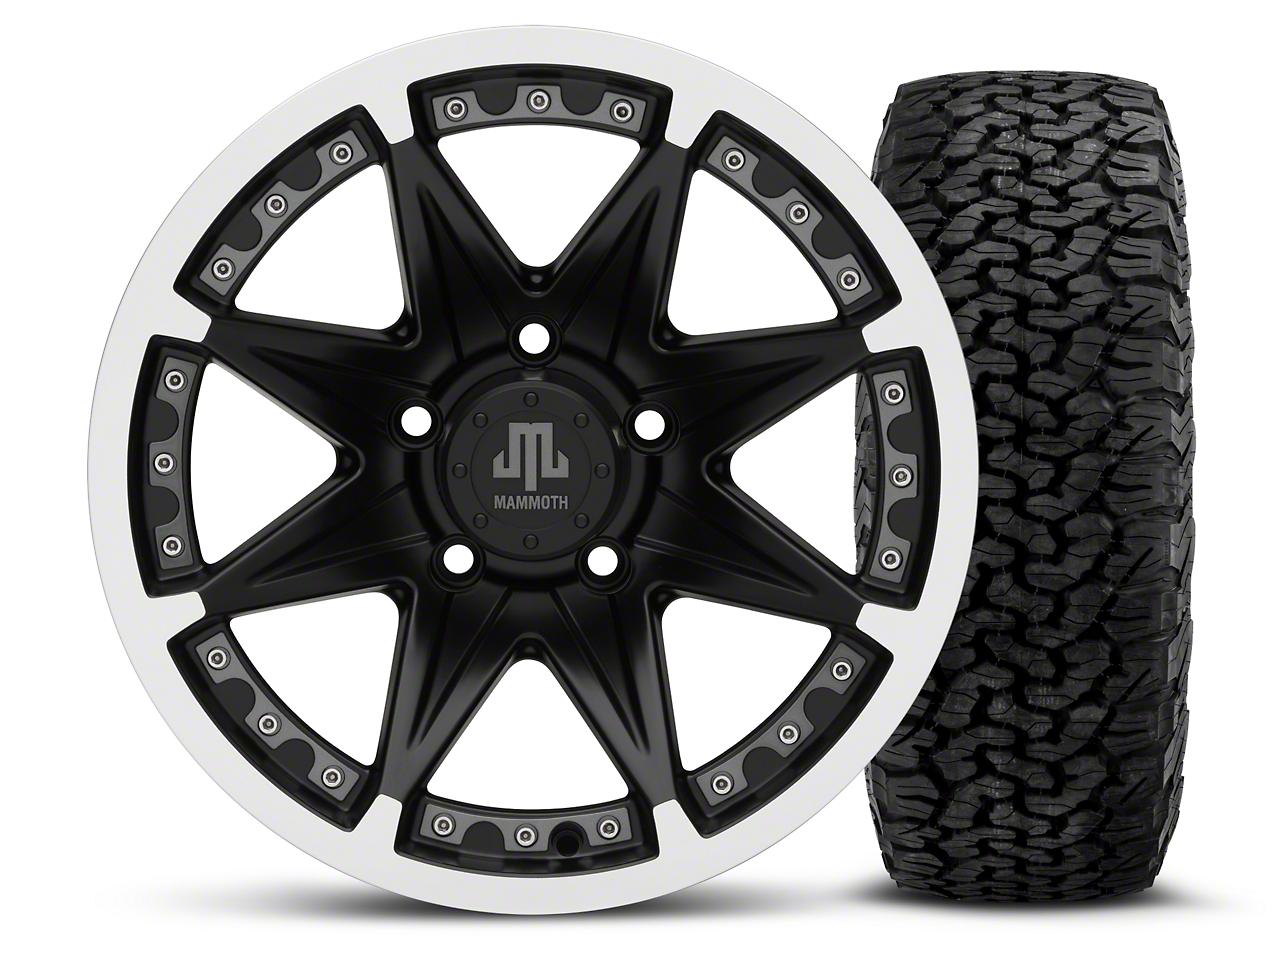 Mammoth Type 88 Black - 16x8 Wheel - and BF Goodrich All Terrain TA KO2 Tire - 305/70R16 (07-18 Jeep Wrangler JK; 2018 Jeep Wrangler JL)